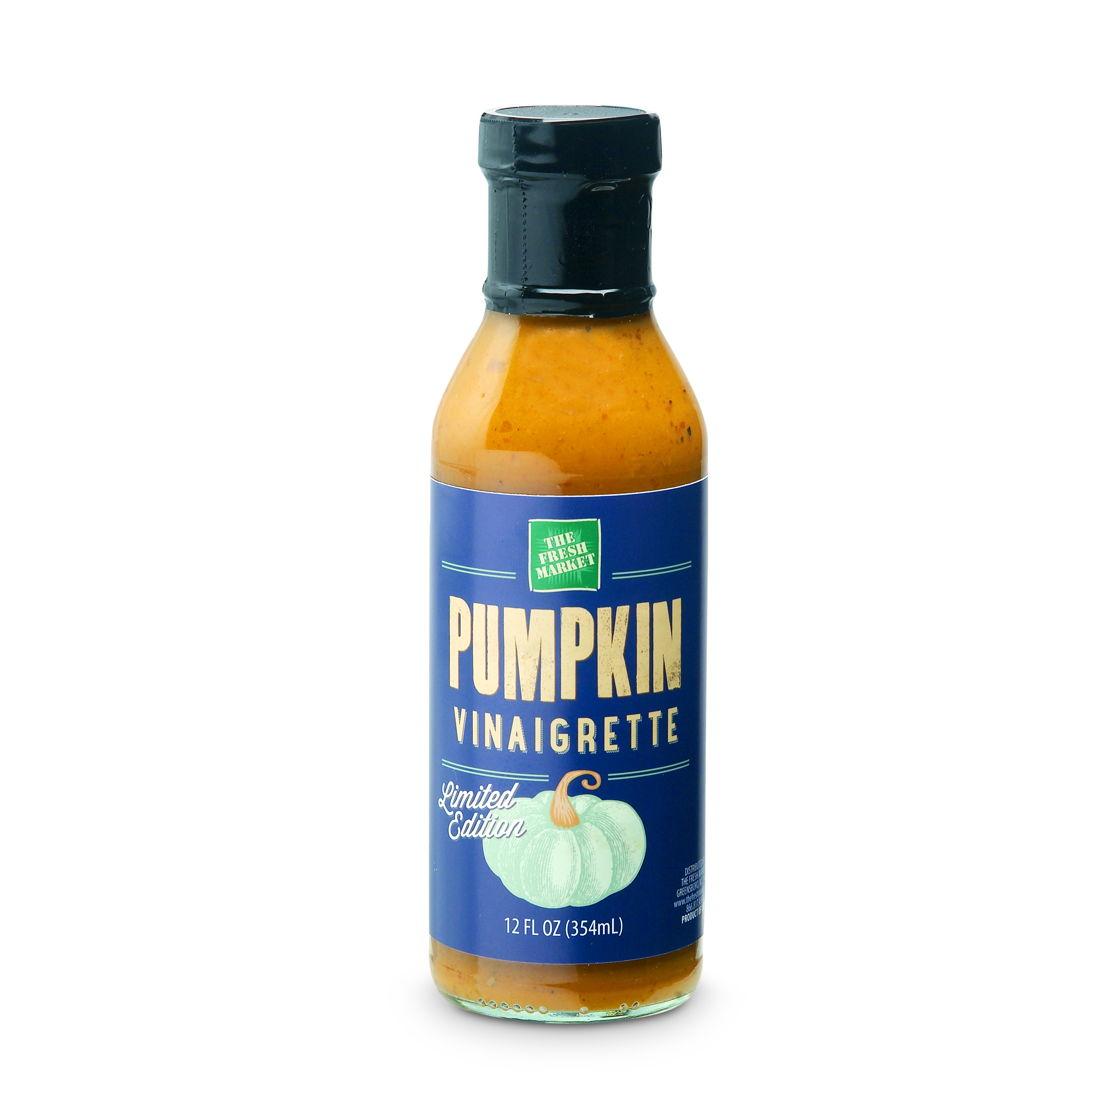 TFM Pumpkin Vinaigrette